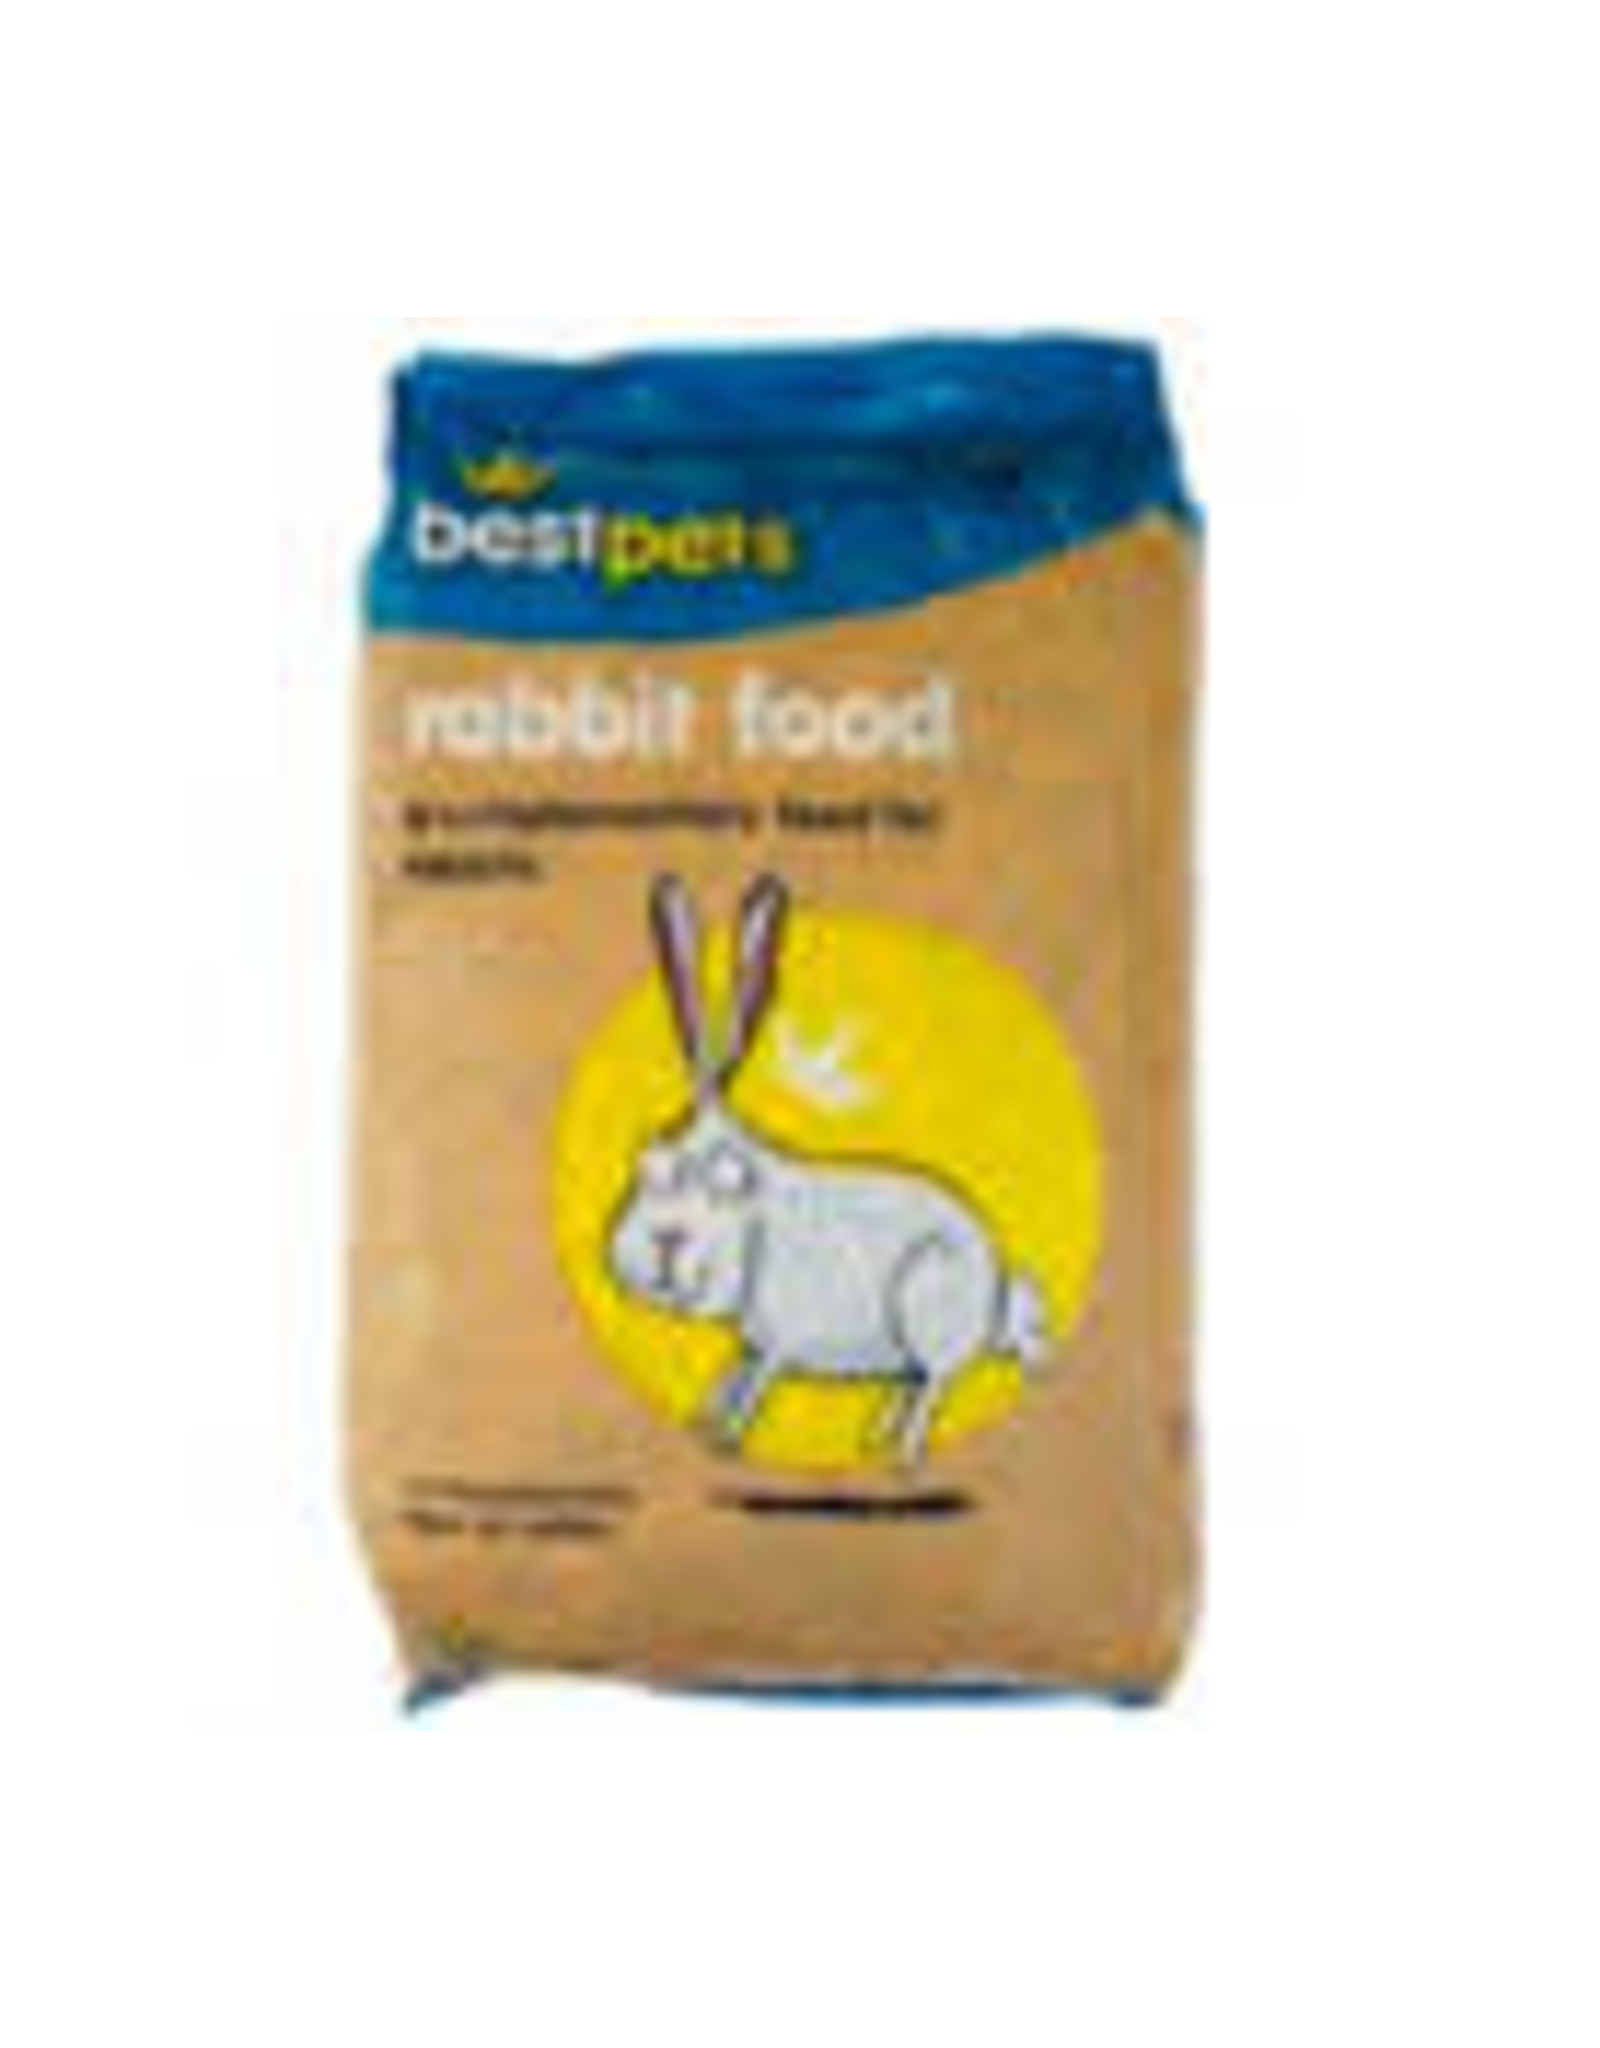 BestPets BestPets Rabbit Food Mix 15kg